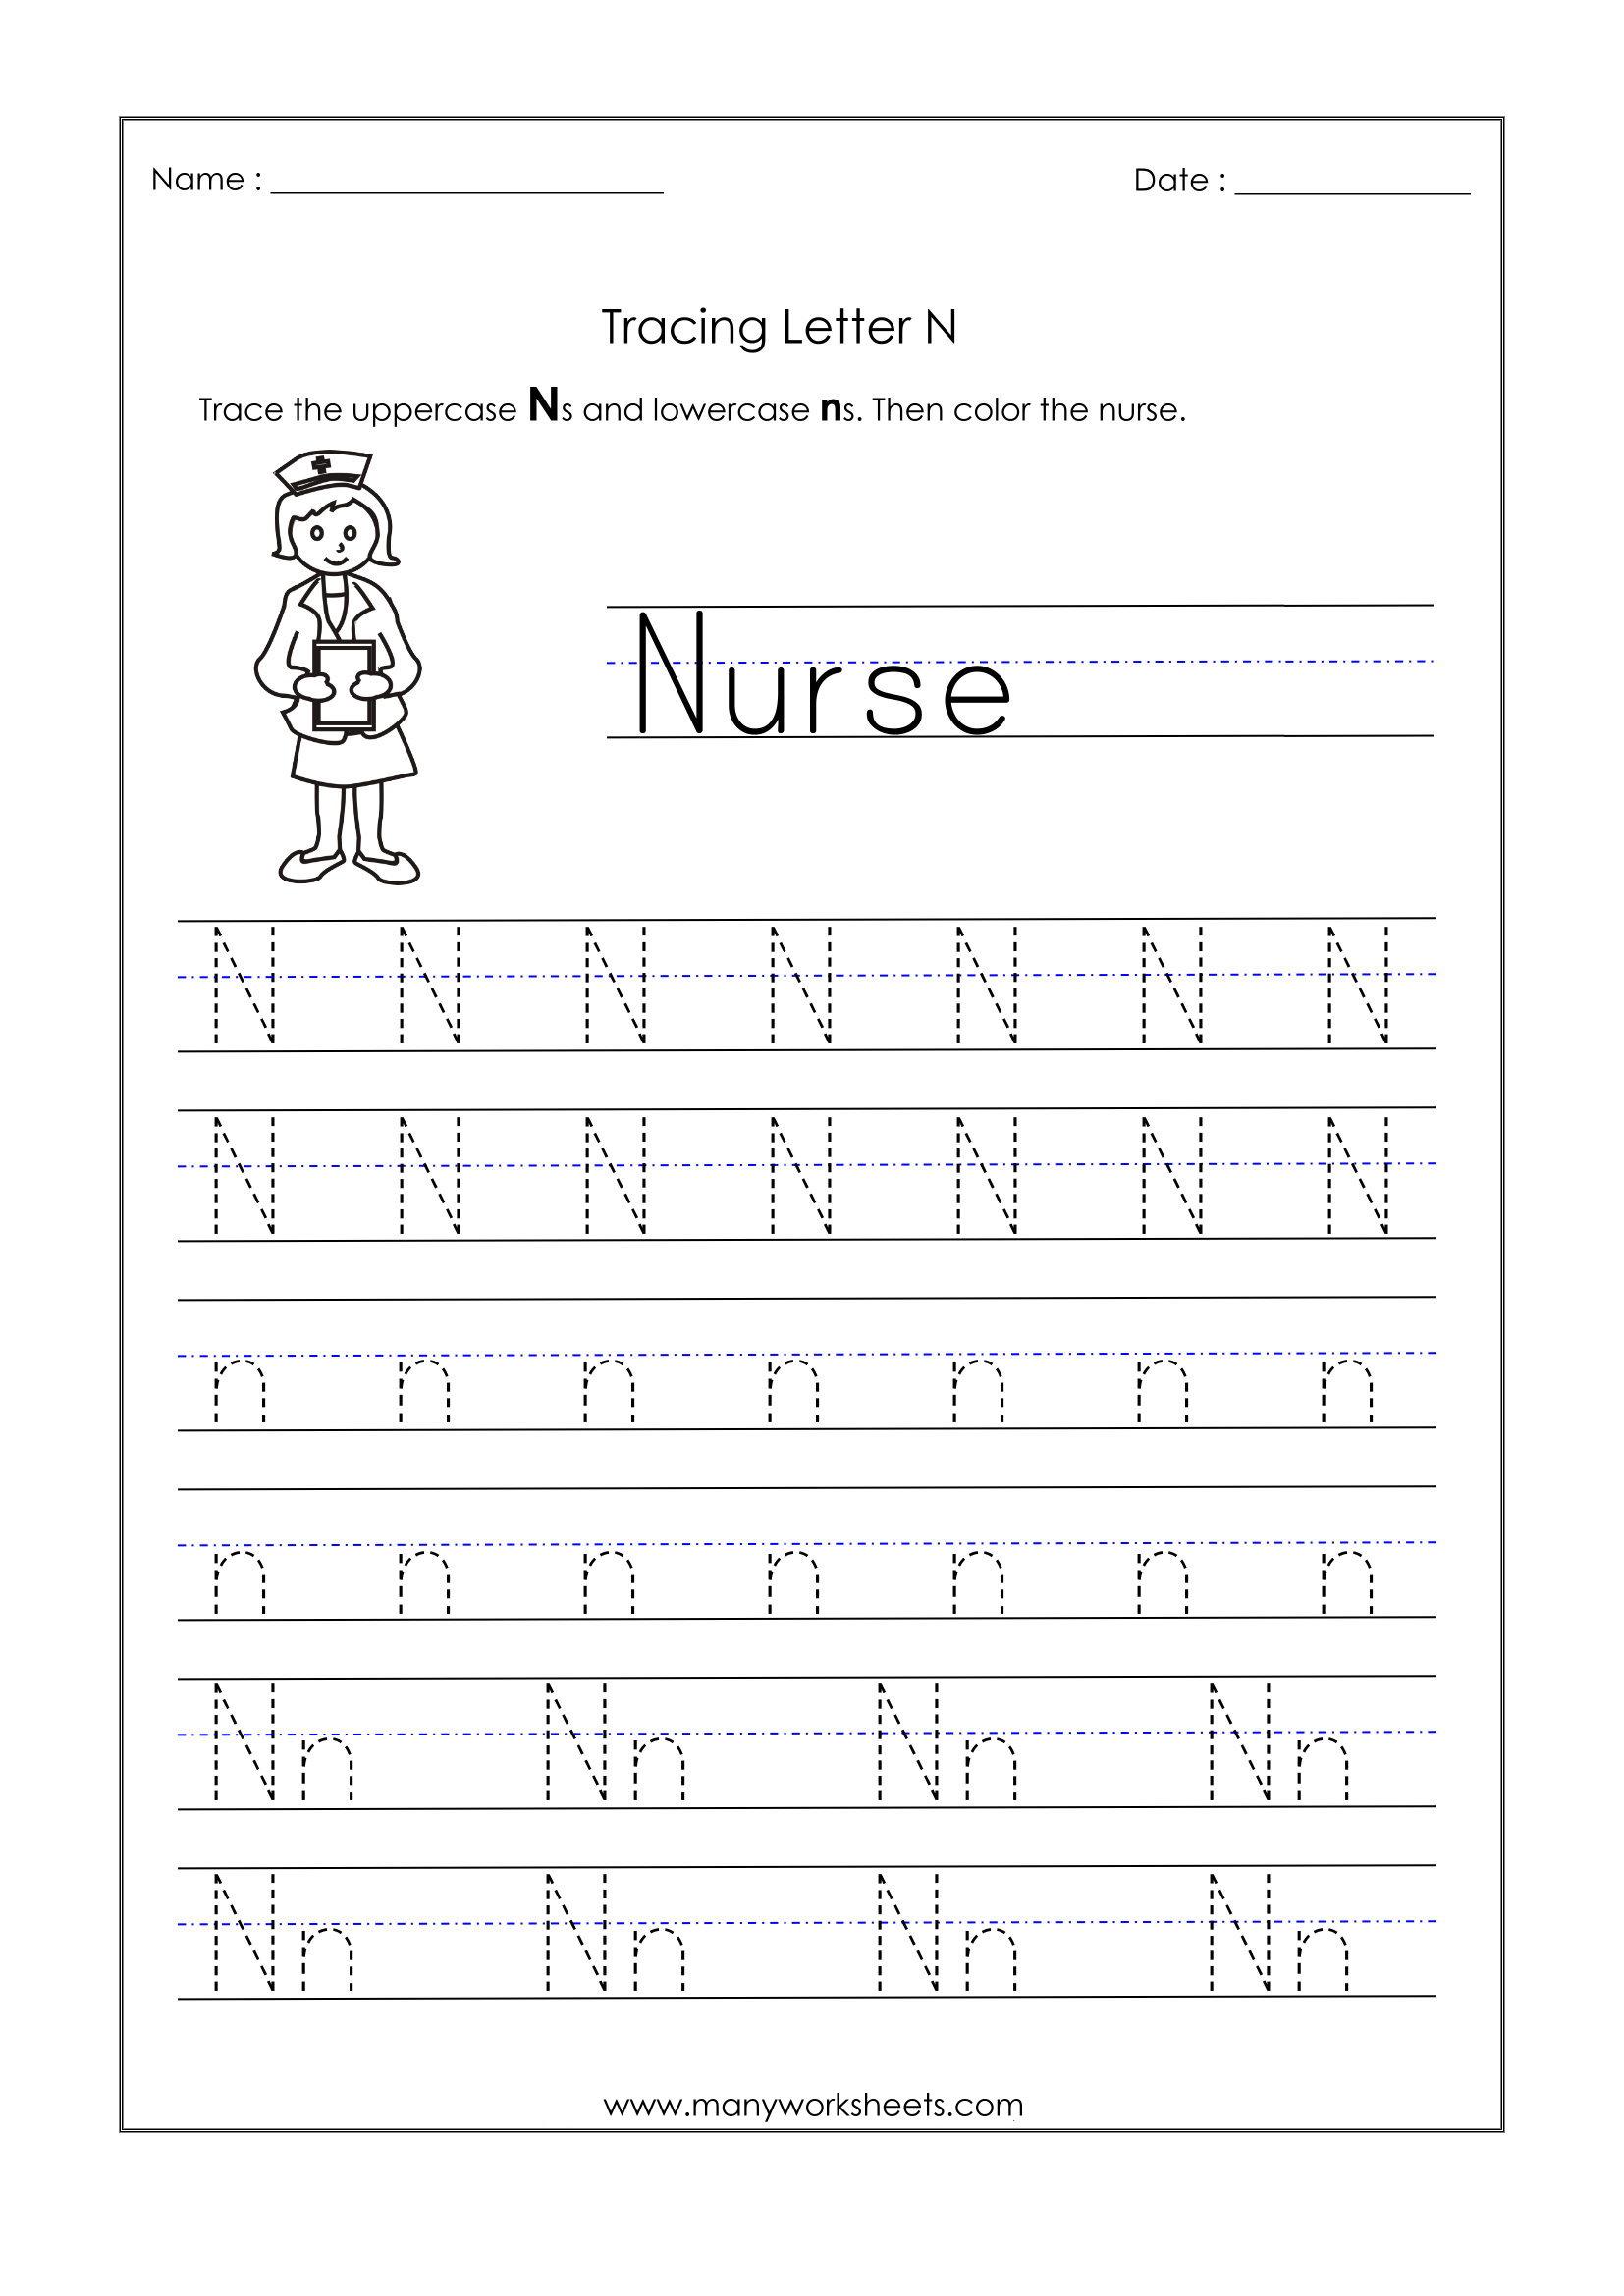 Tracing Letter Nn Worksheet